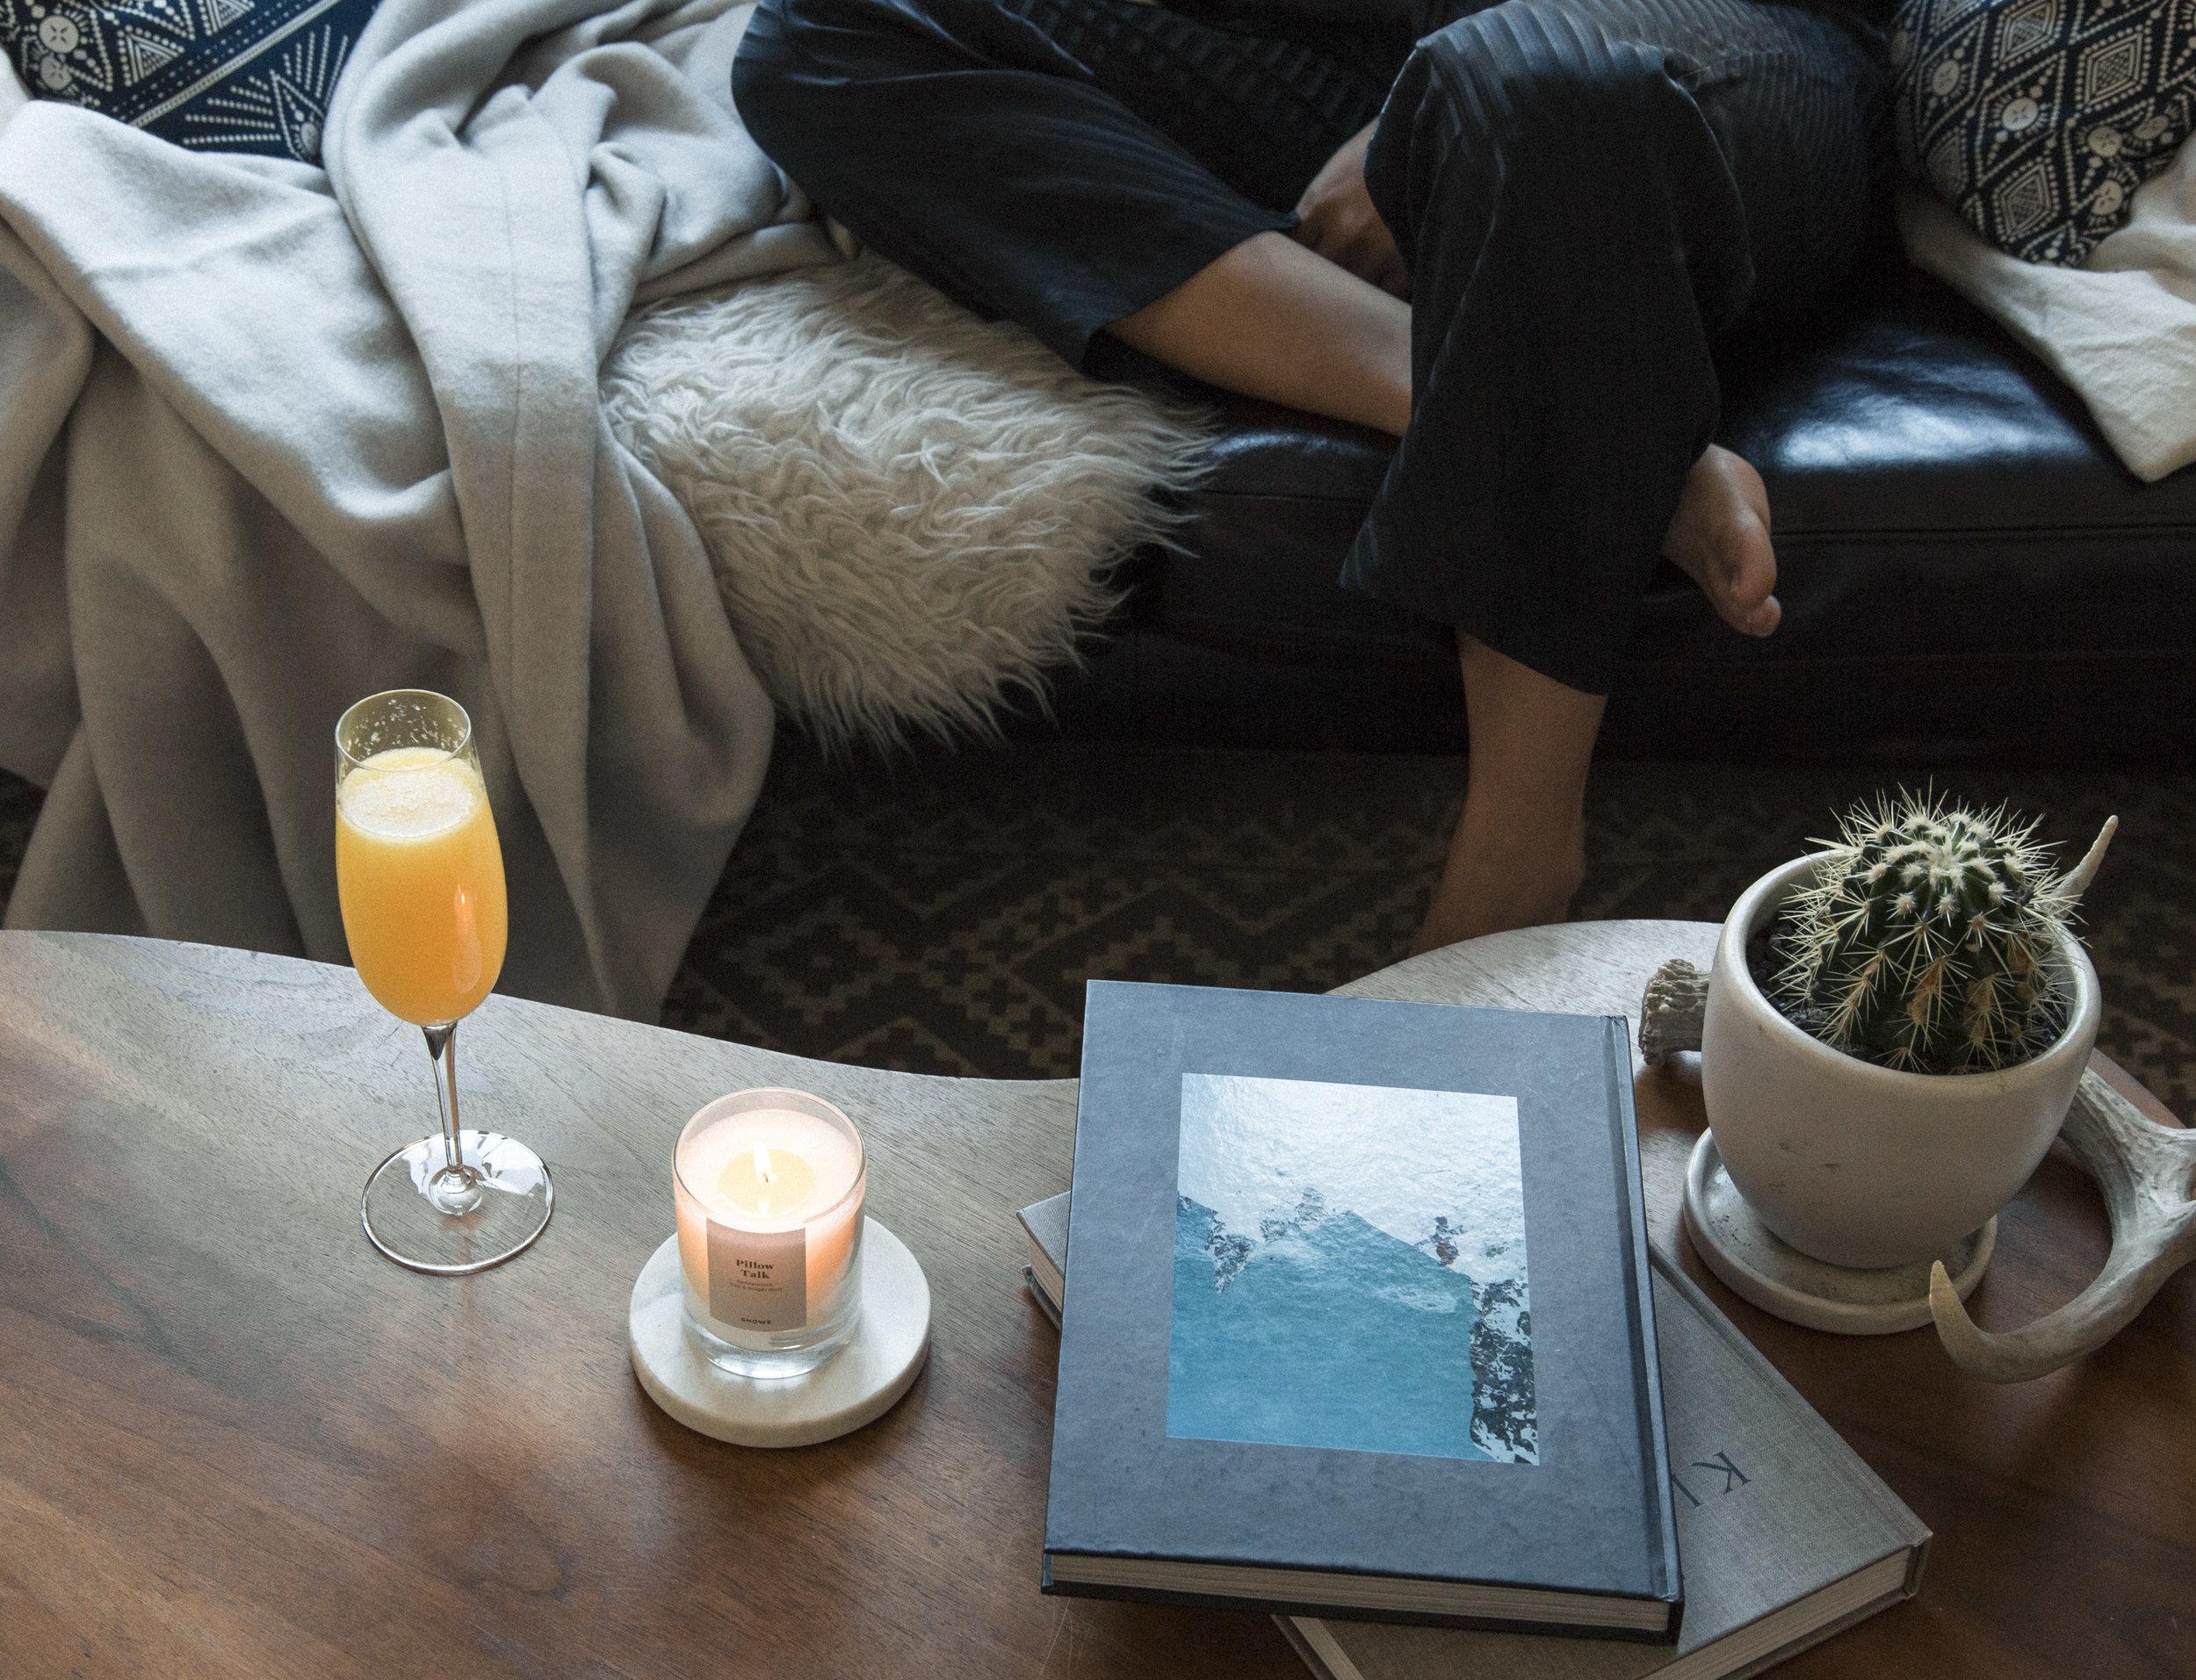 caitlin_miyako_taylor_snowe_champagne_glass_candle_blanket